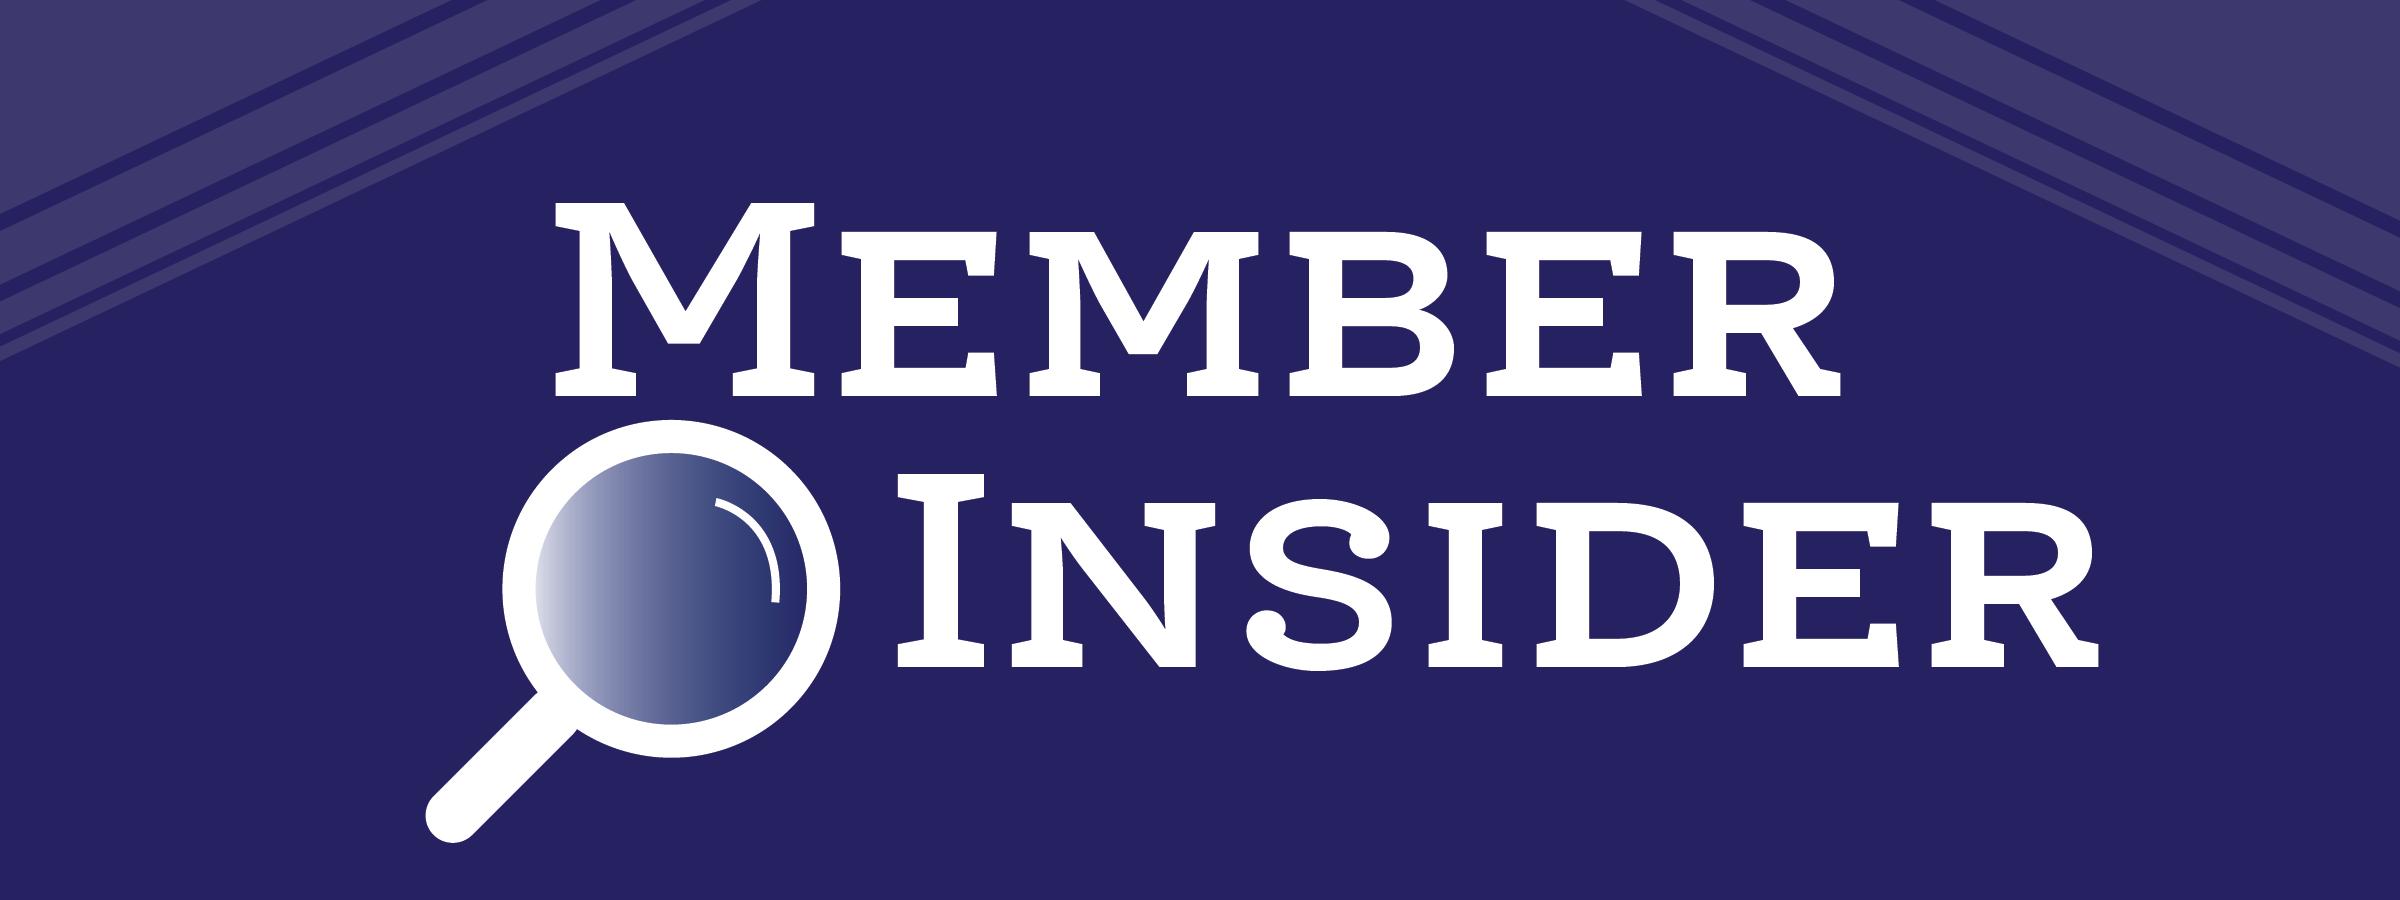 Image for Batavia Chamber Member Insider - Meet Jamie Saam